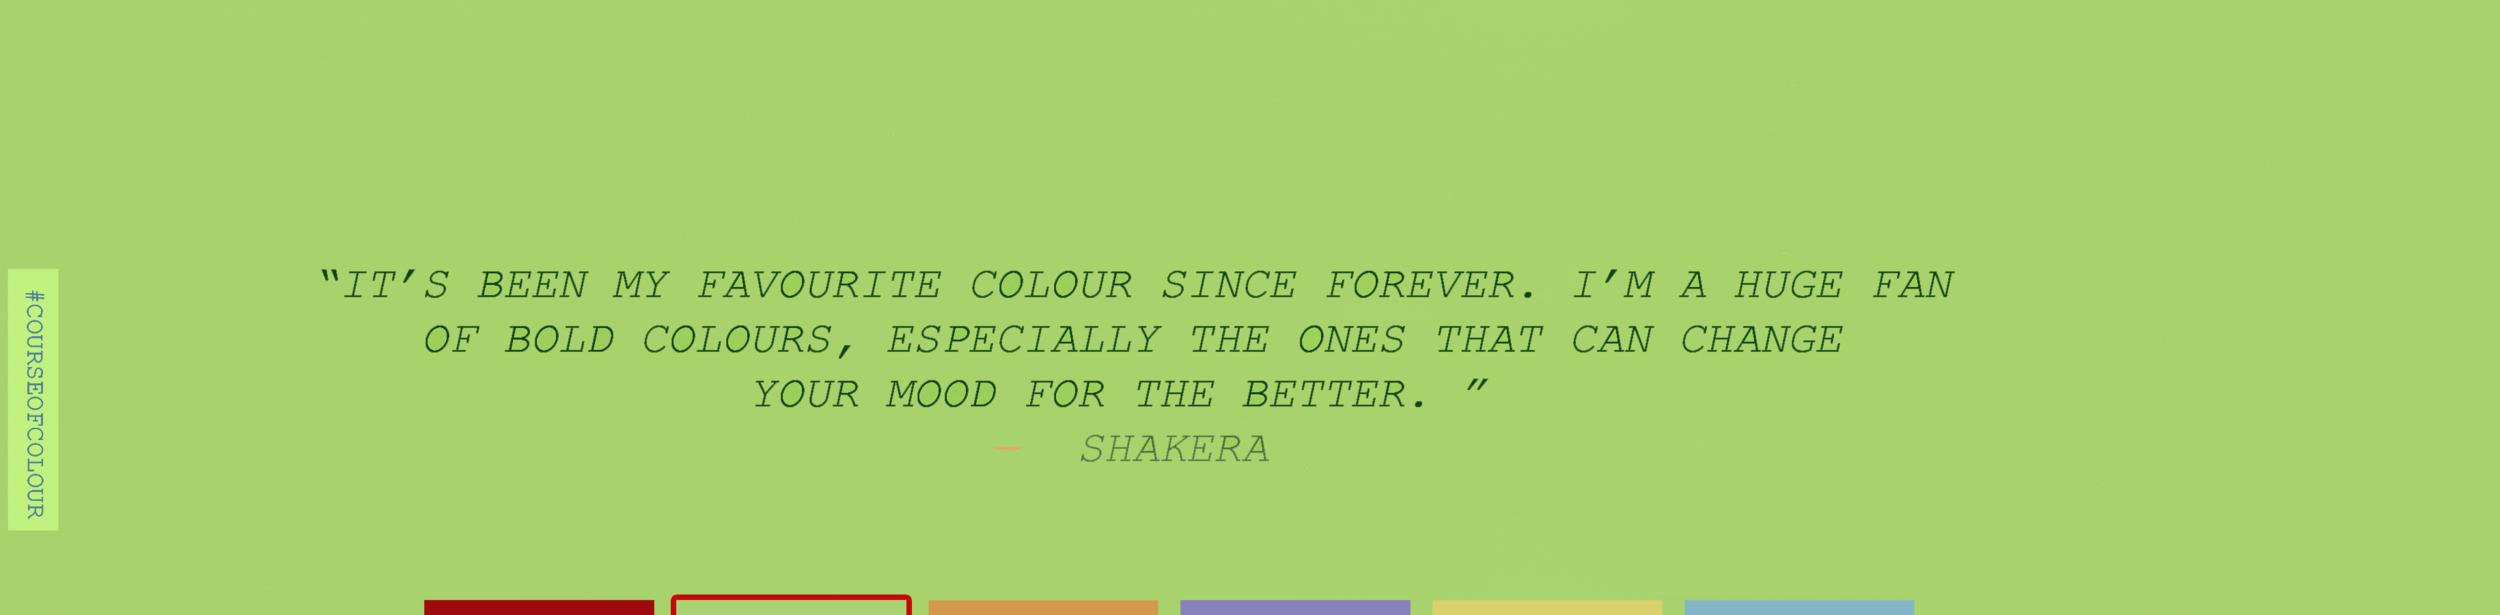 0006 SHAKERA.png